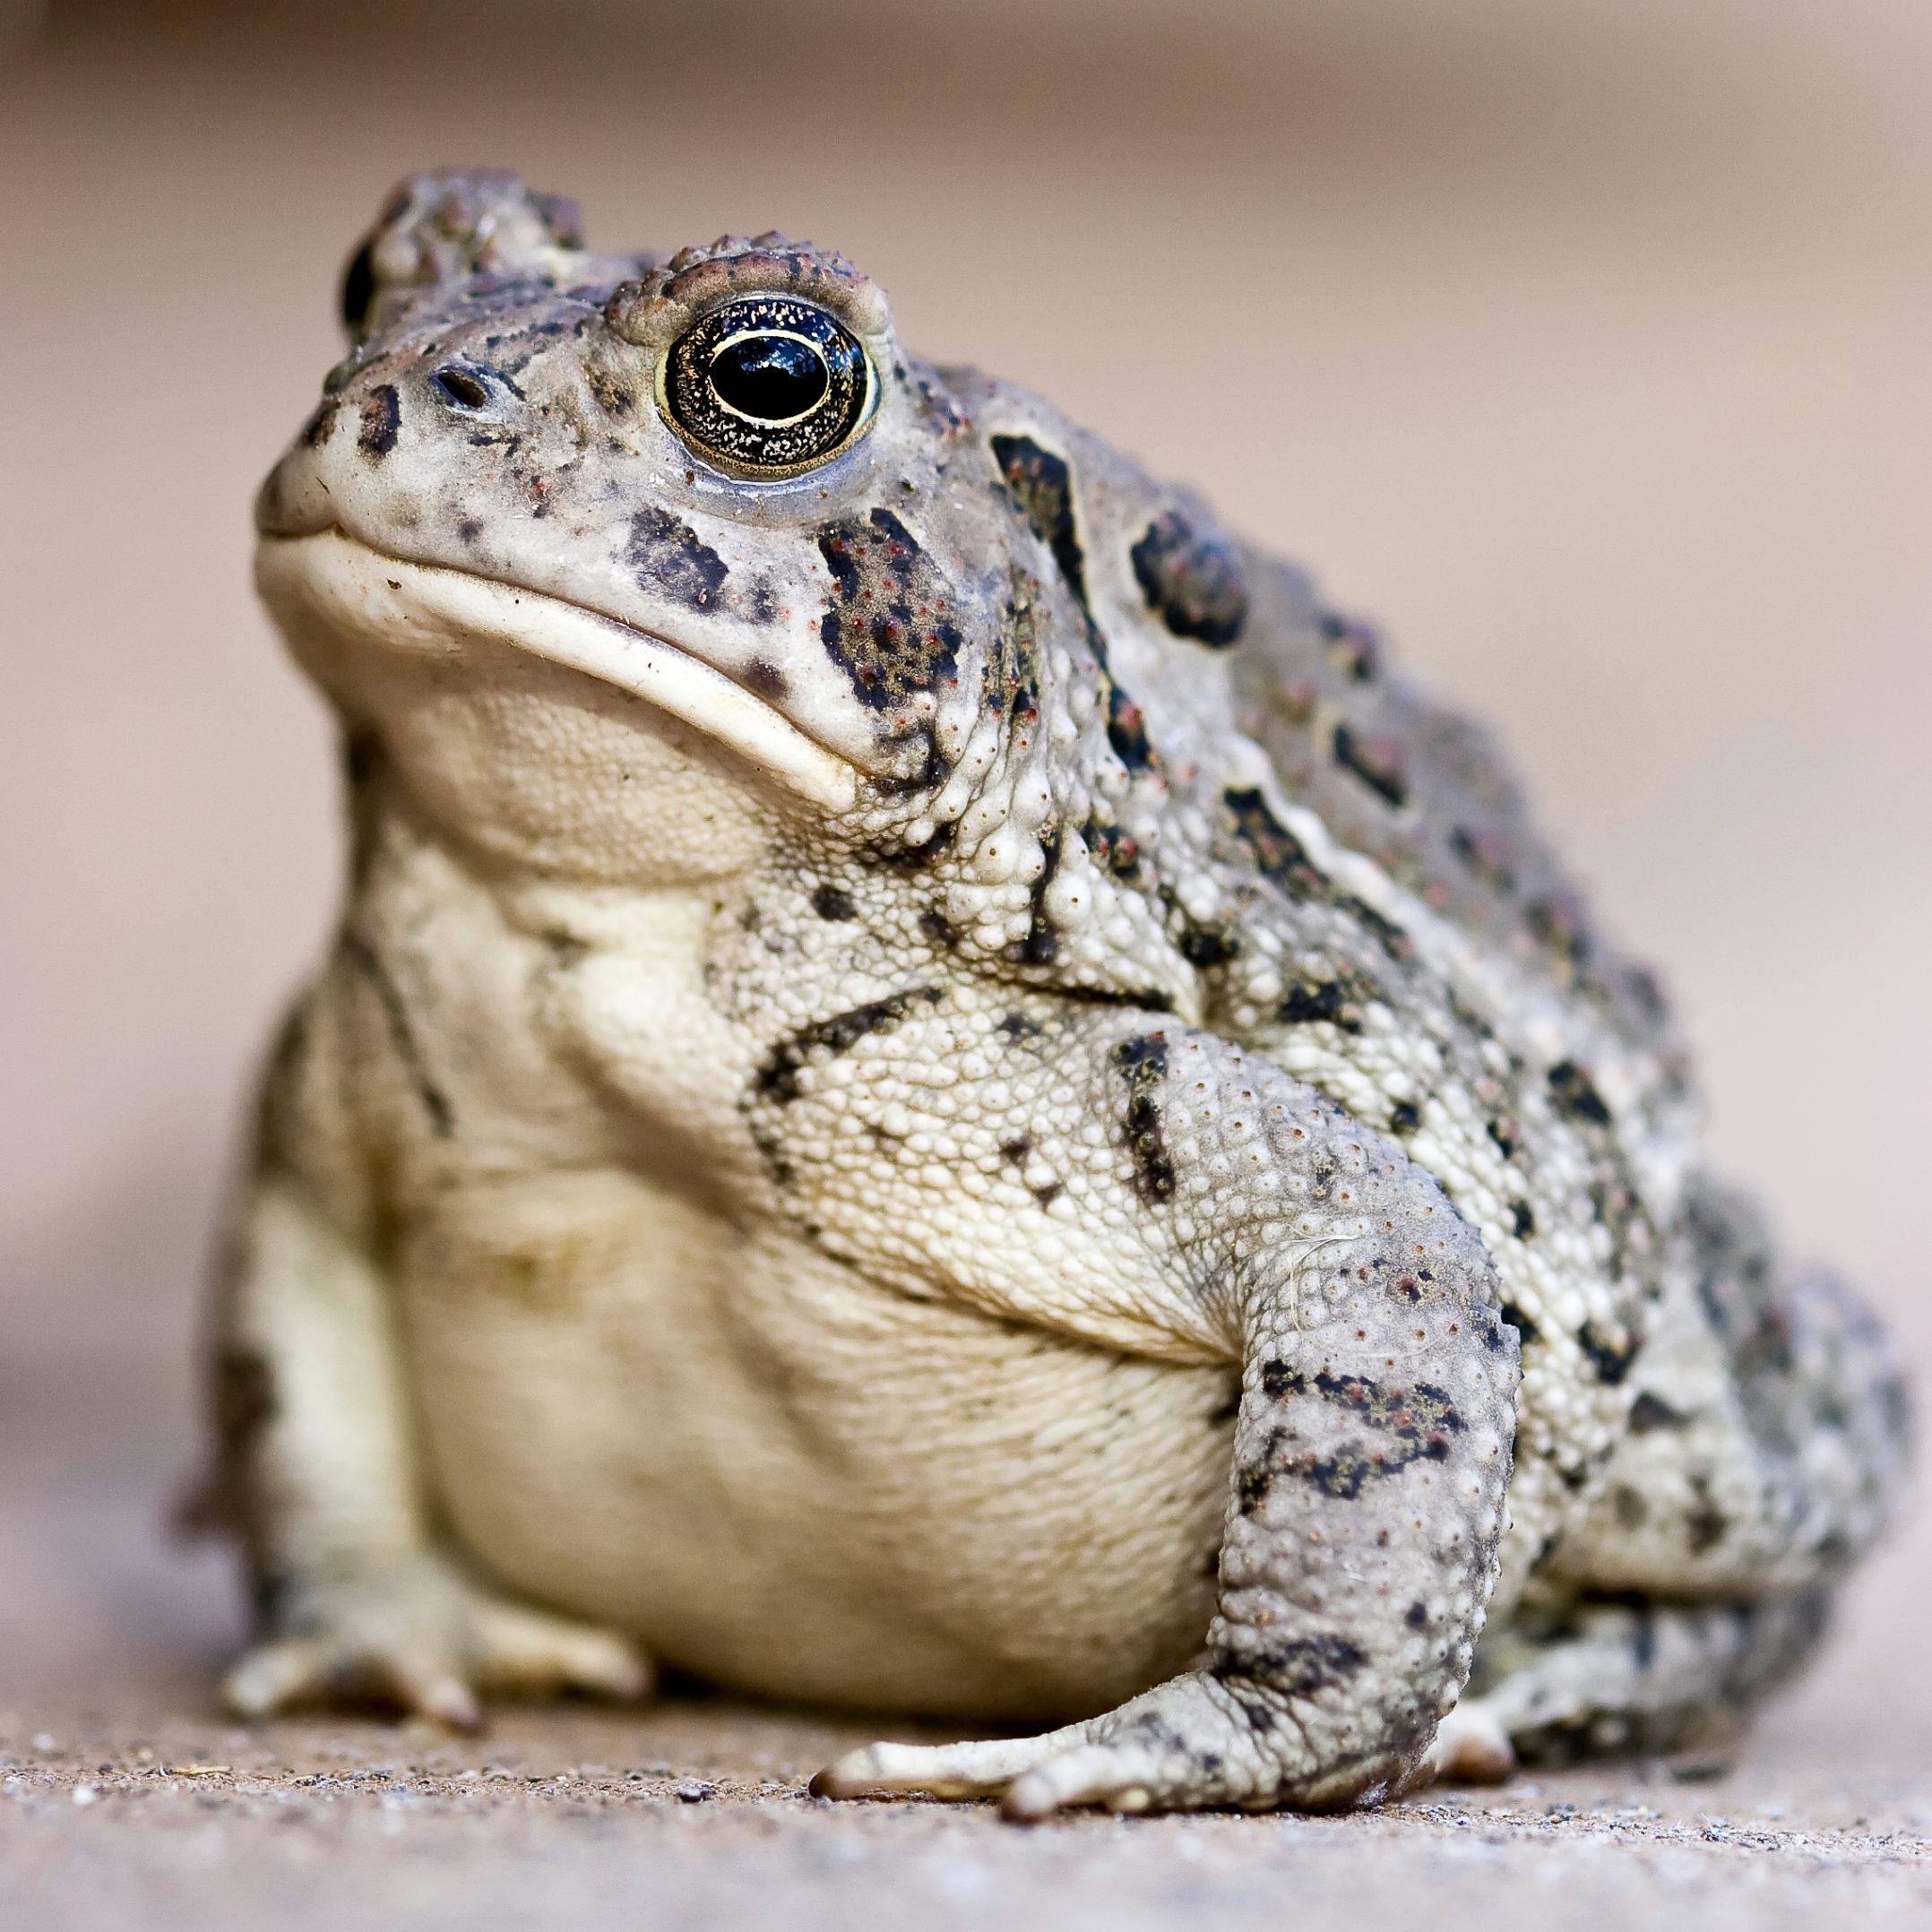 Монгольская жаба bufo raddei